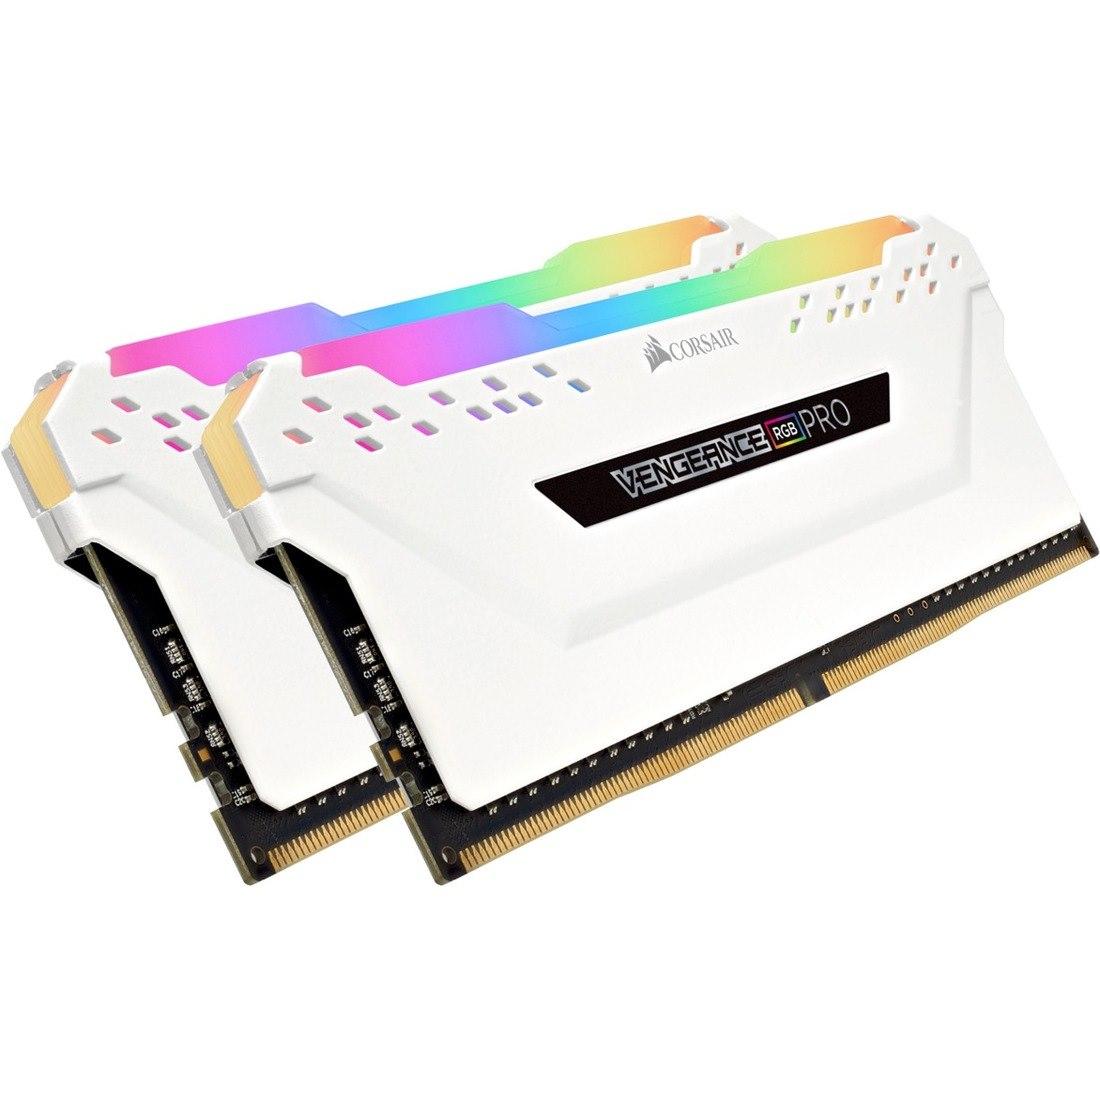 Corsair Vengeance RGB Pro RAM Module - 16 GB (2 x 8 GB) - DDR4-3200/PC4-25600 DDR4 SDRAM - CL16 - 1.35 V